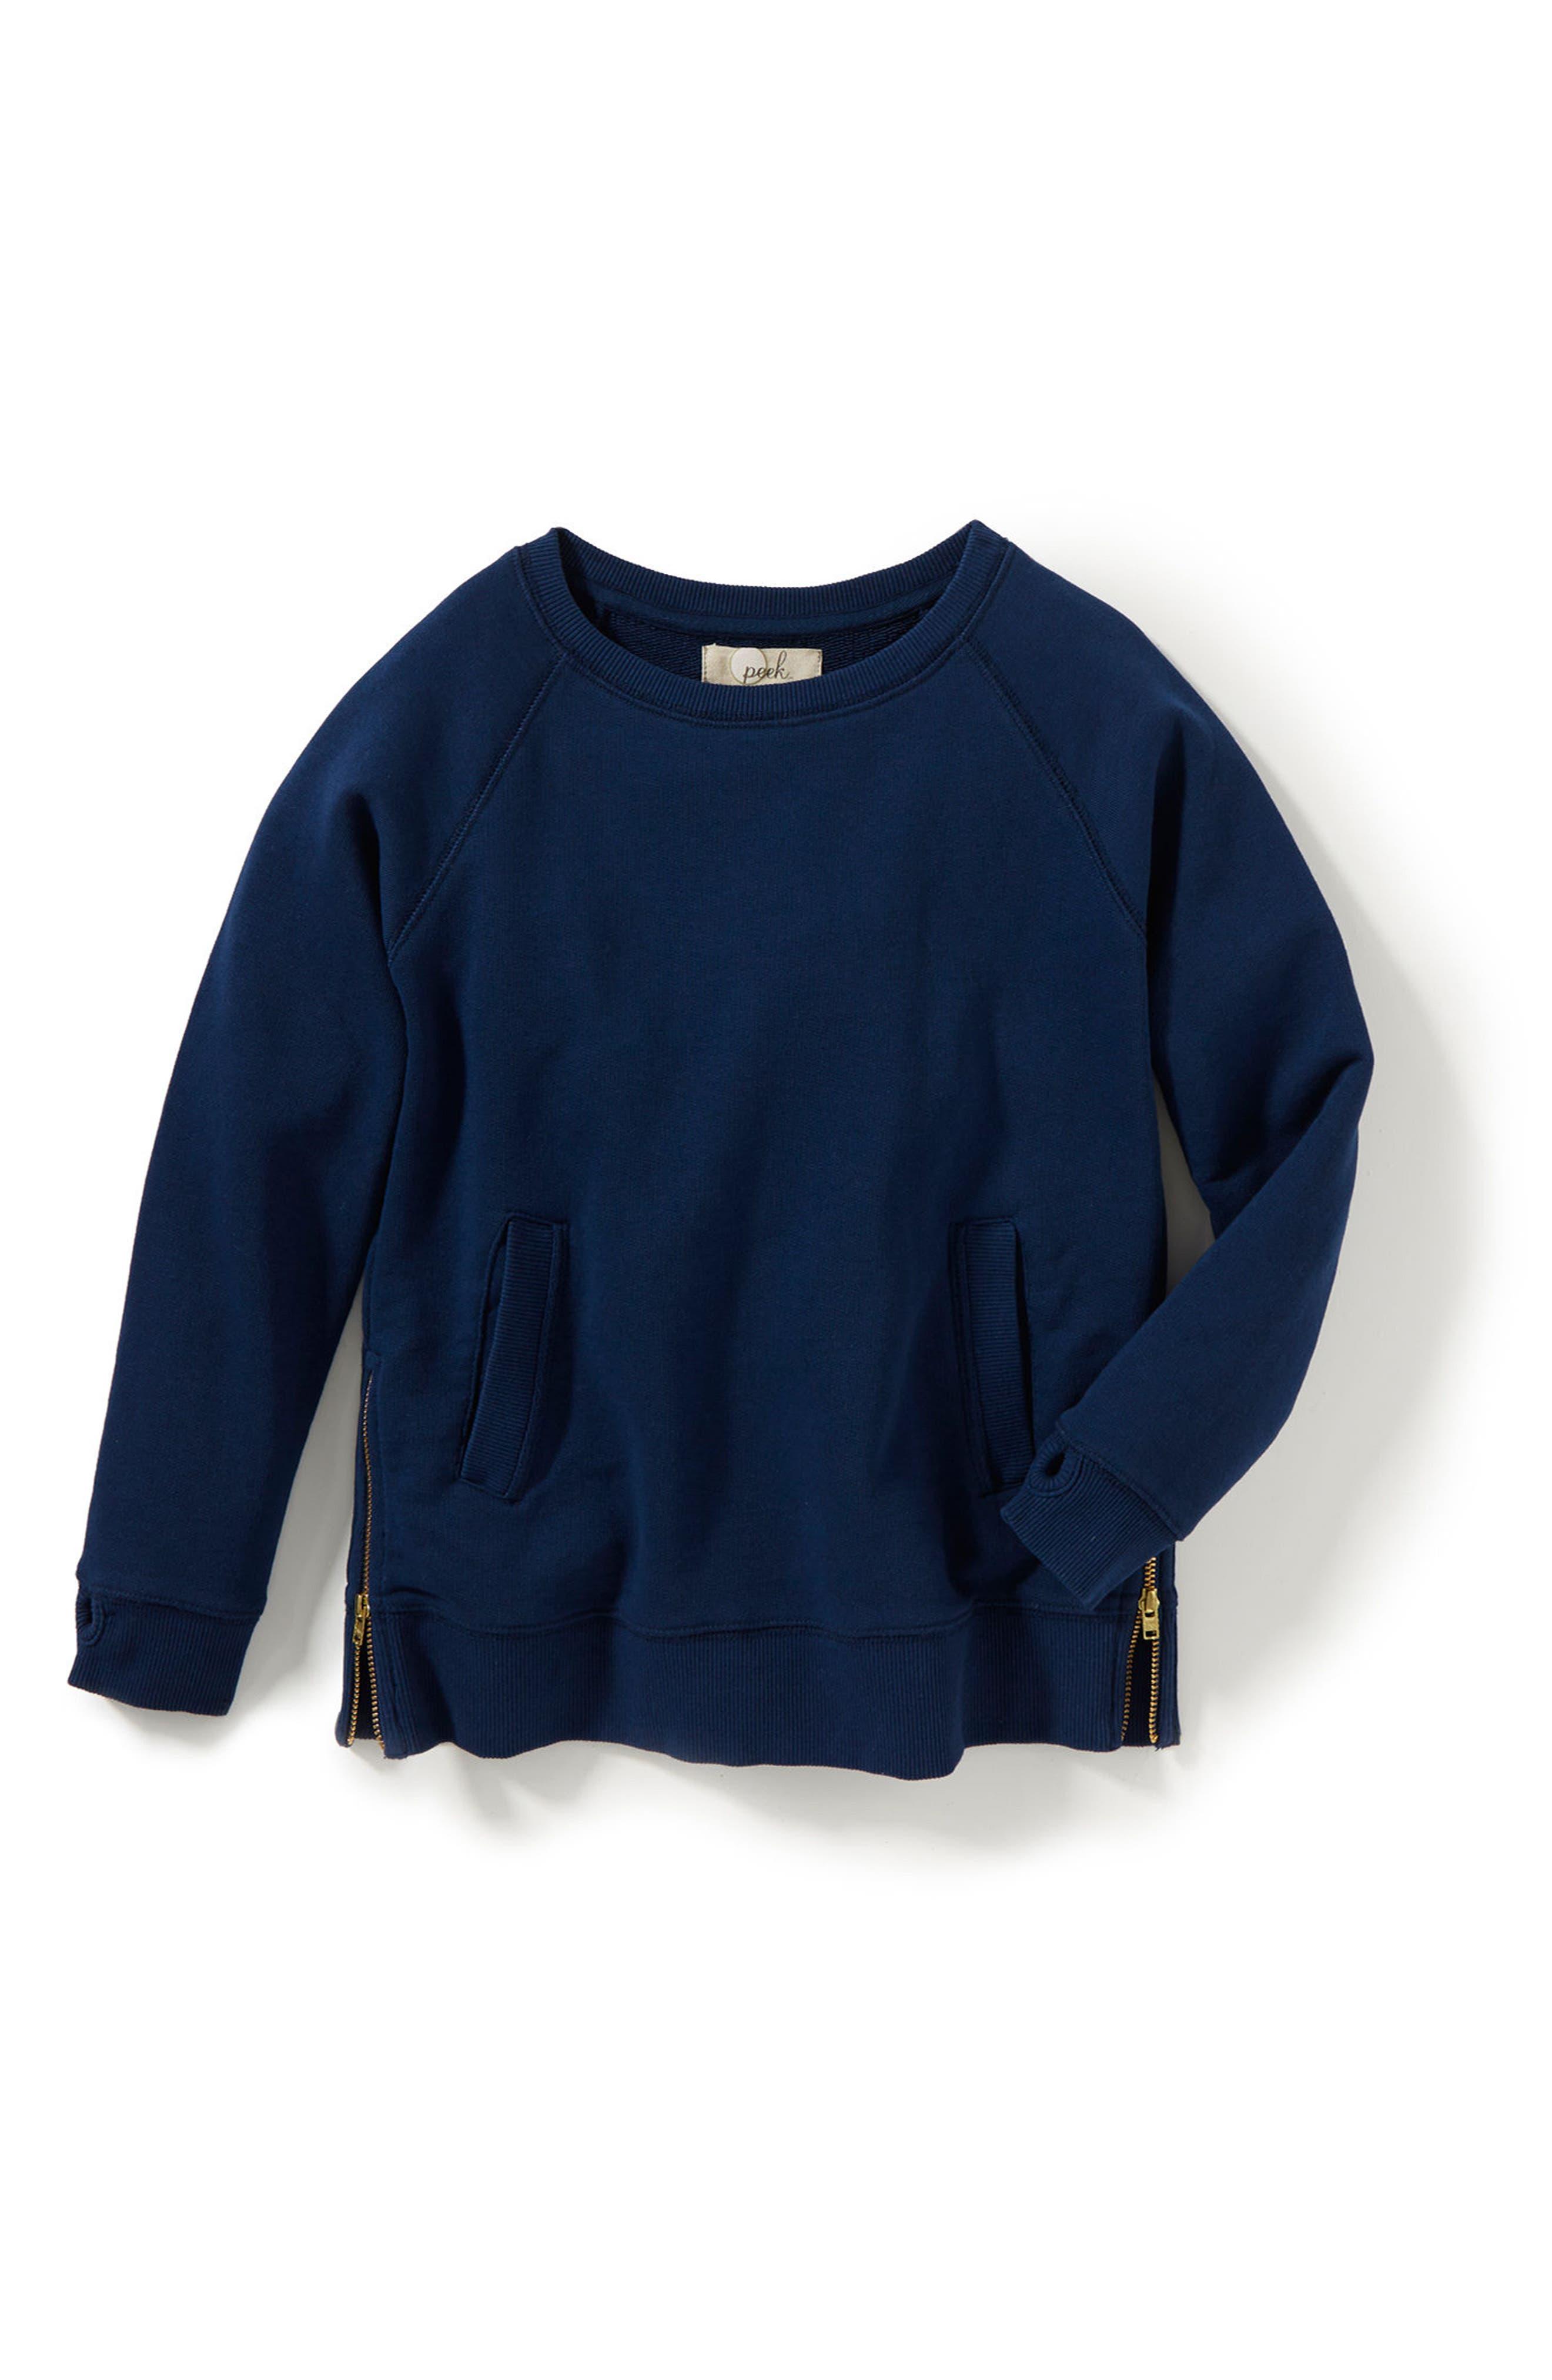 Peek Bailey Side Zip Sweatshirt